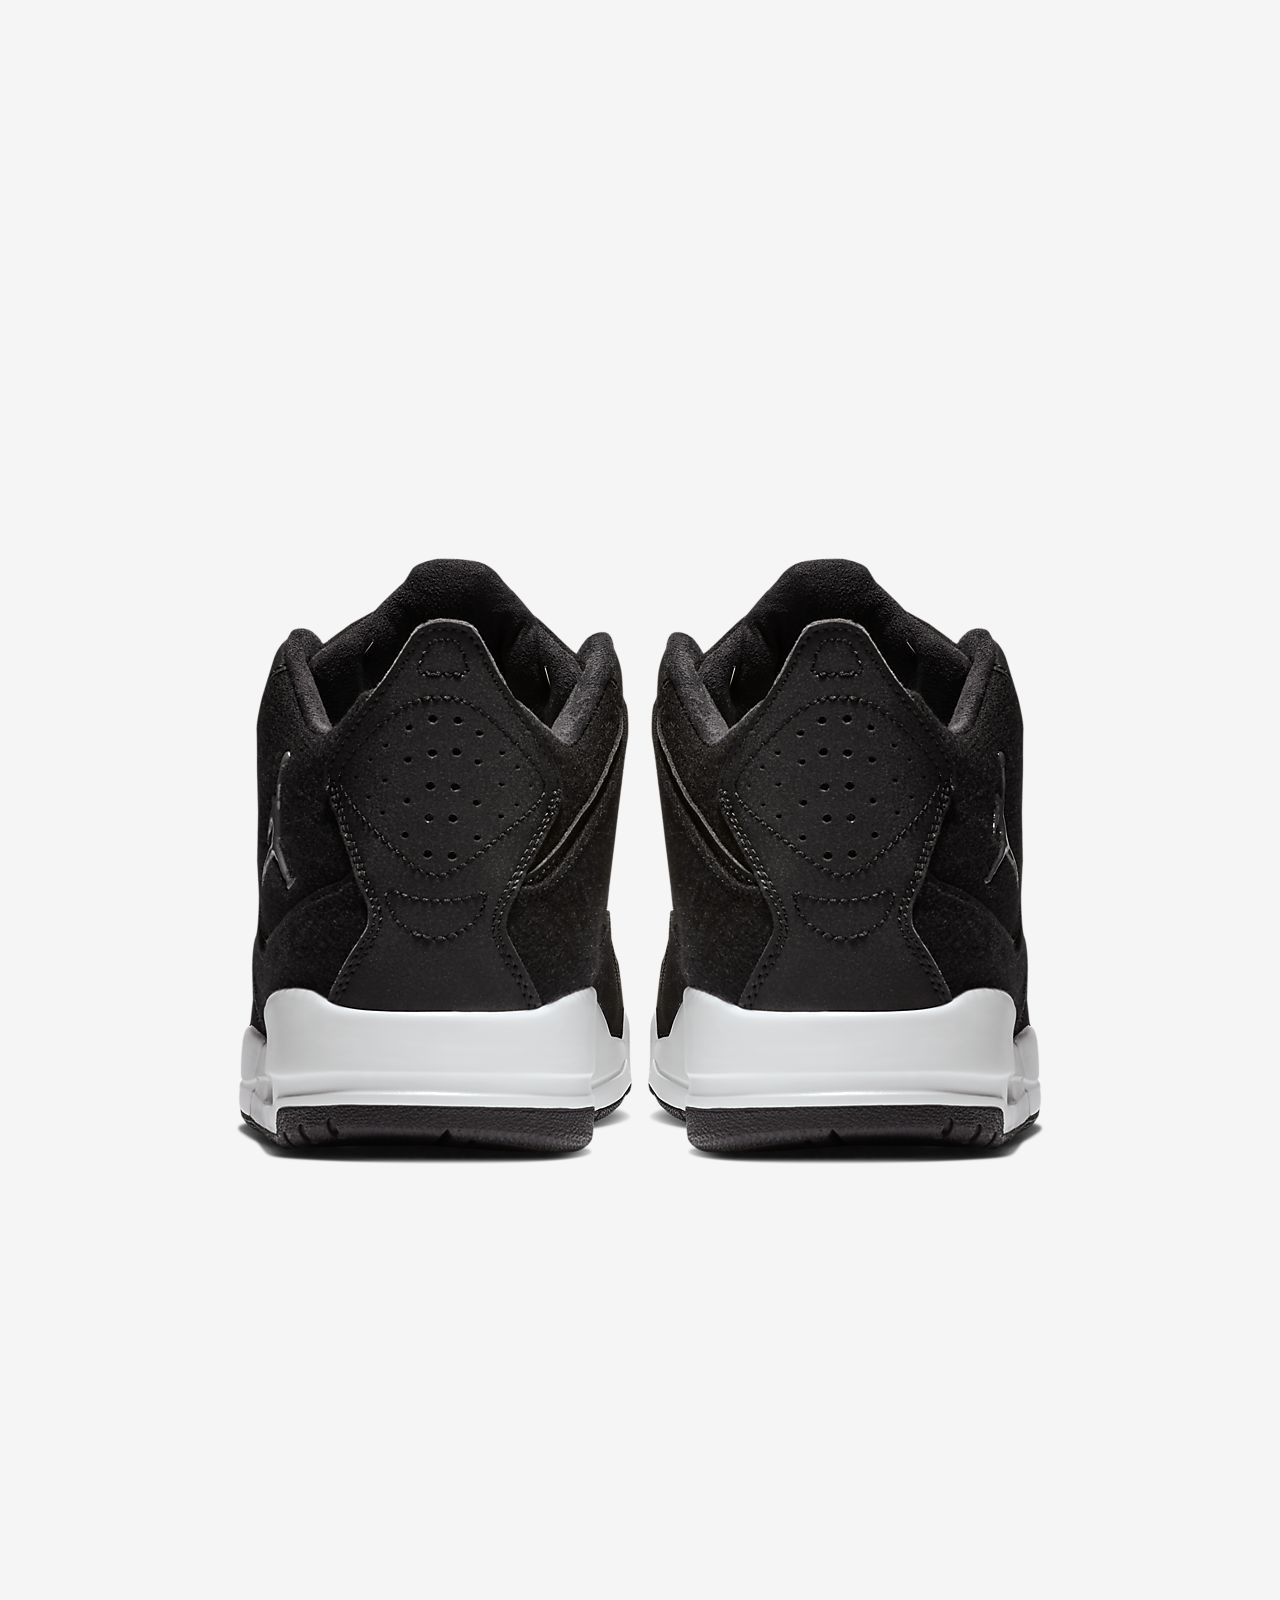 c4690a6697c880 Jordan Courtside 23 Men s Shoe. Nike.com GB